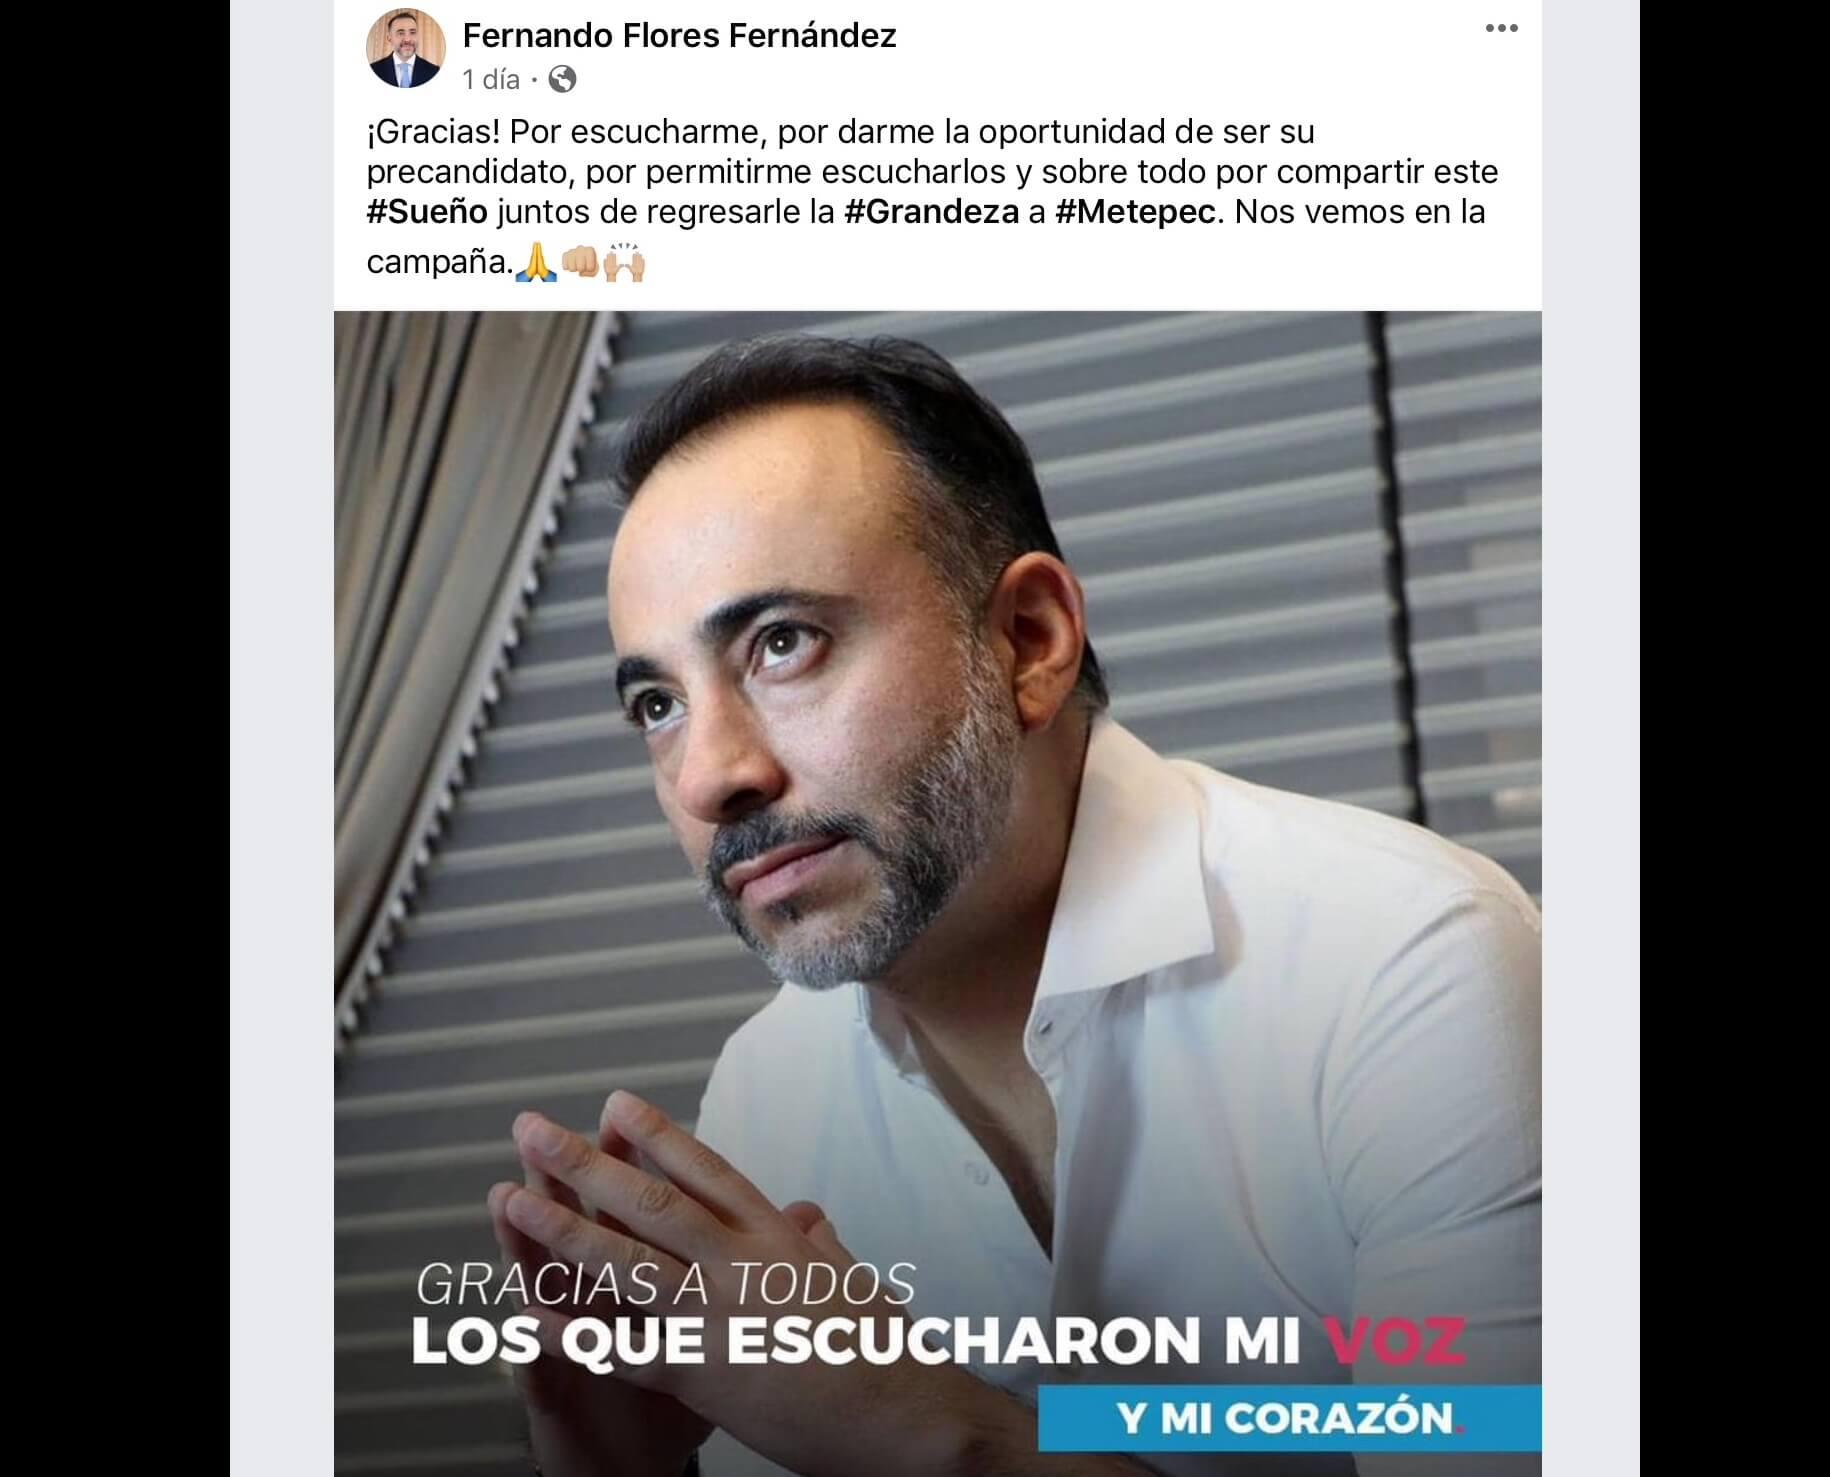 """En jaque"" candidatura de Fernando Flores en Metepec"